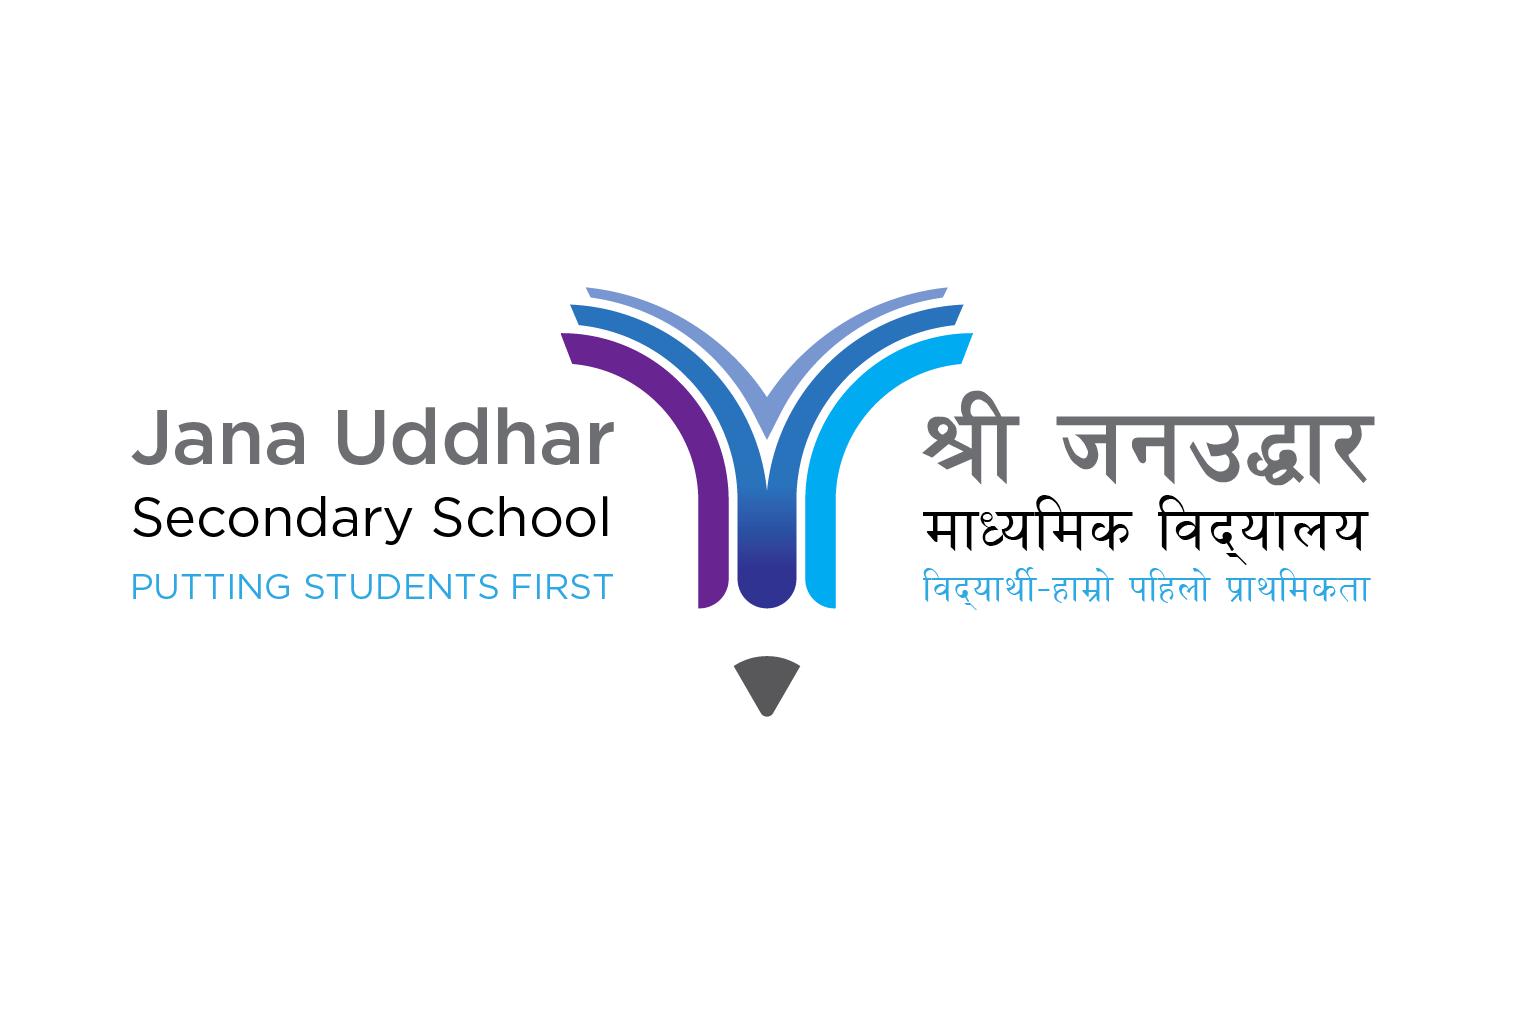 Jana Uddhar Secondary School logo